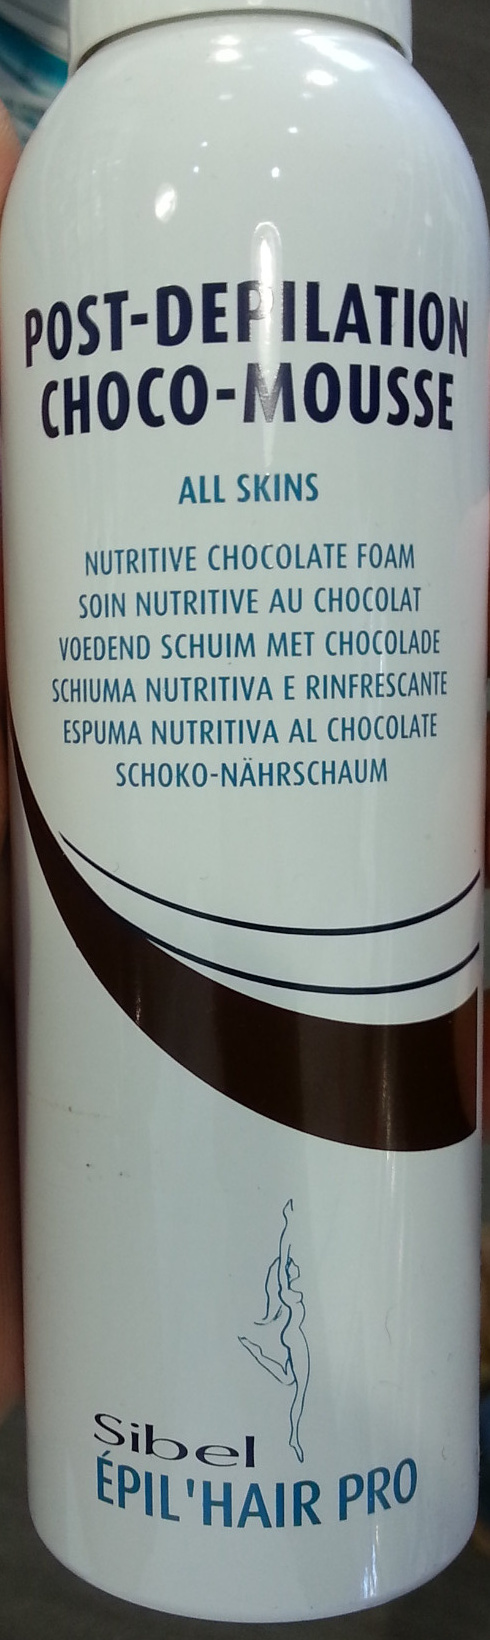 Post-Depilation Choco-Mousse Soin nutritif au chocolat - Product - fr